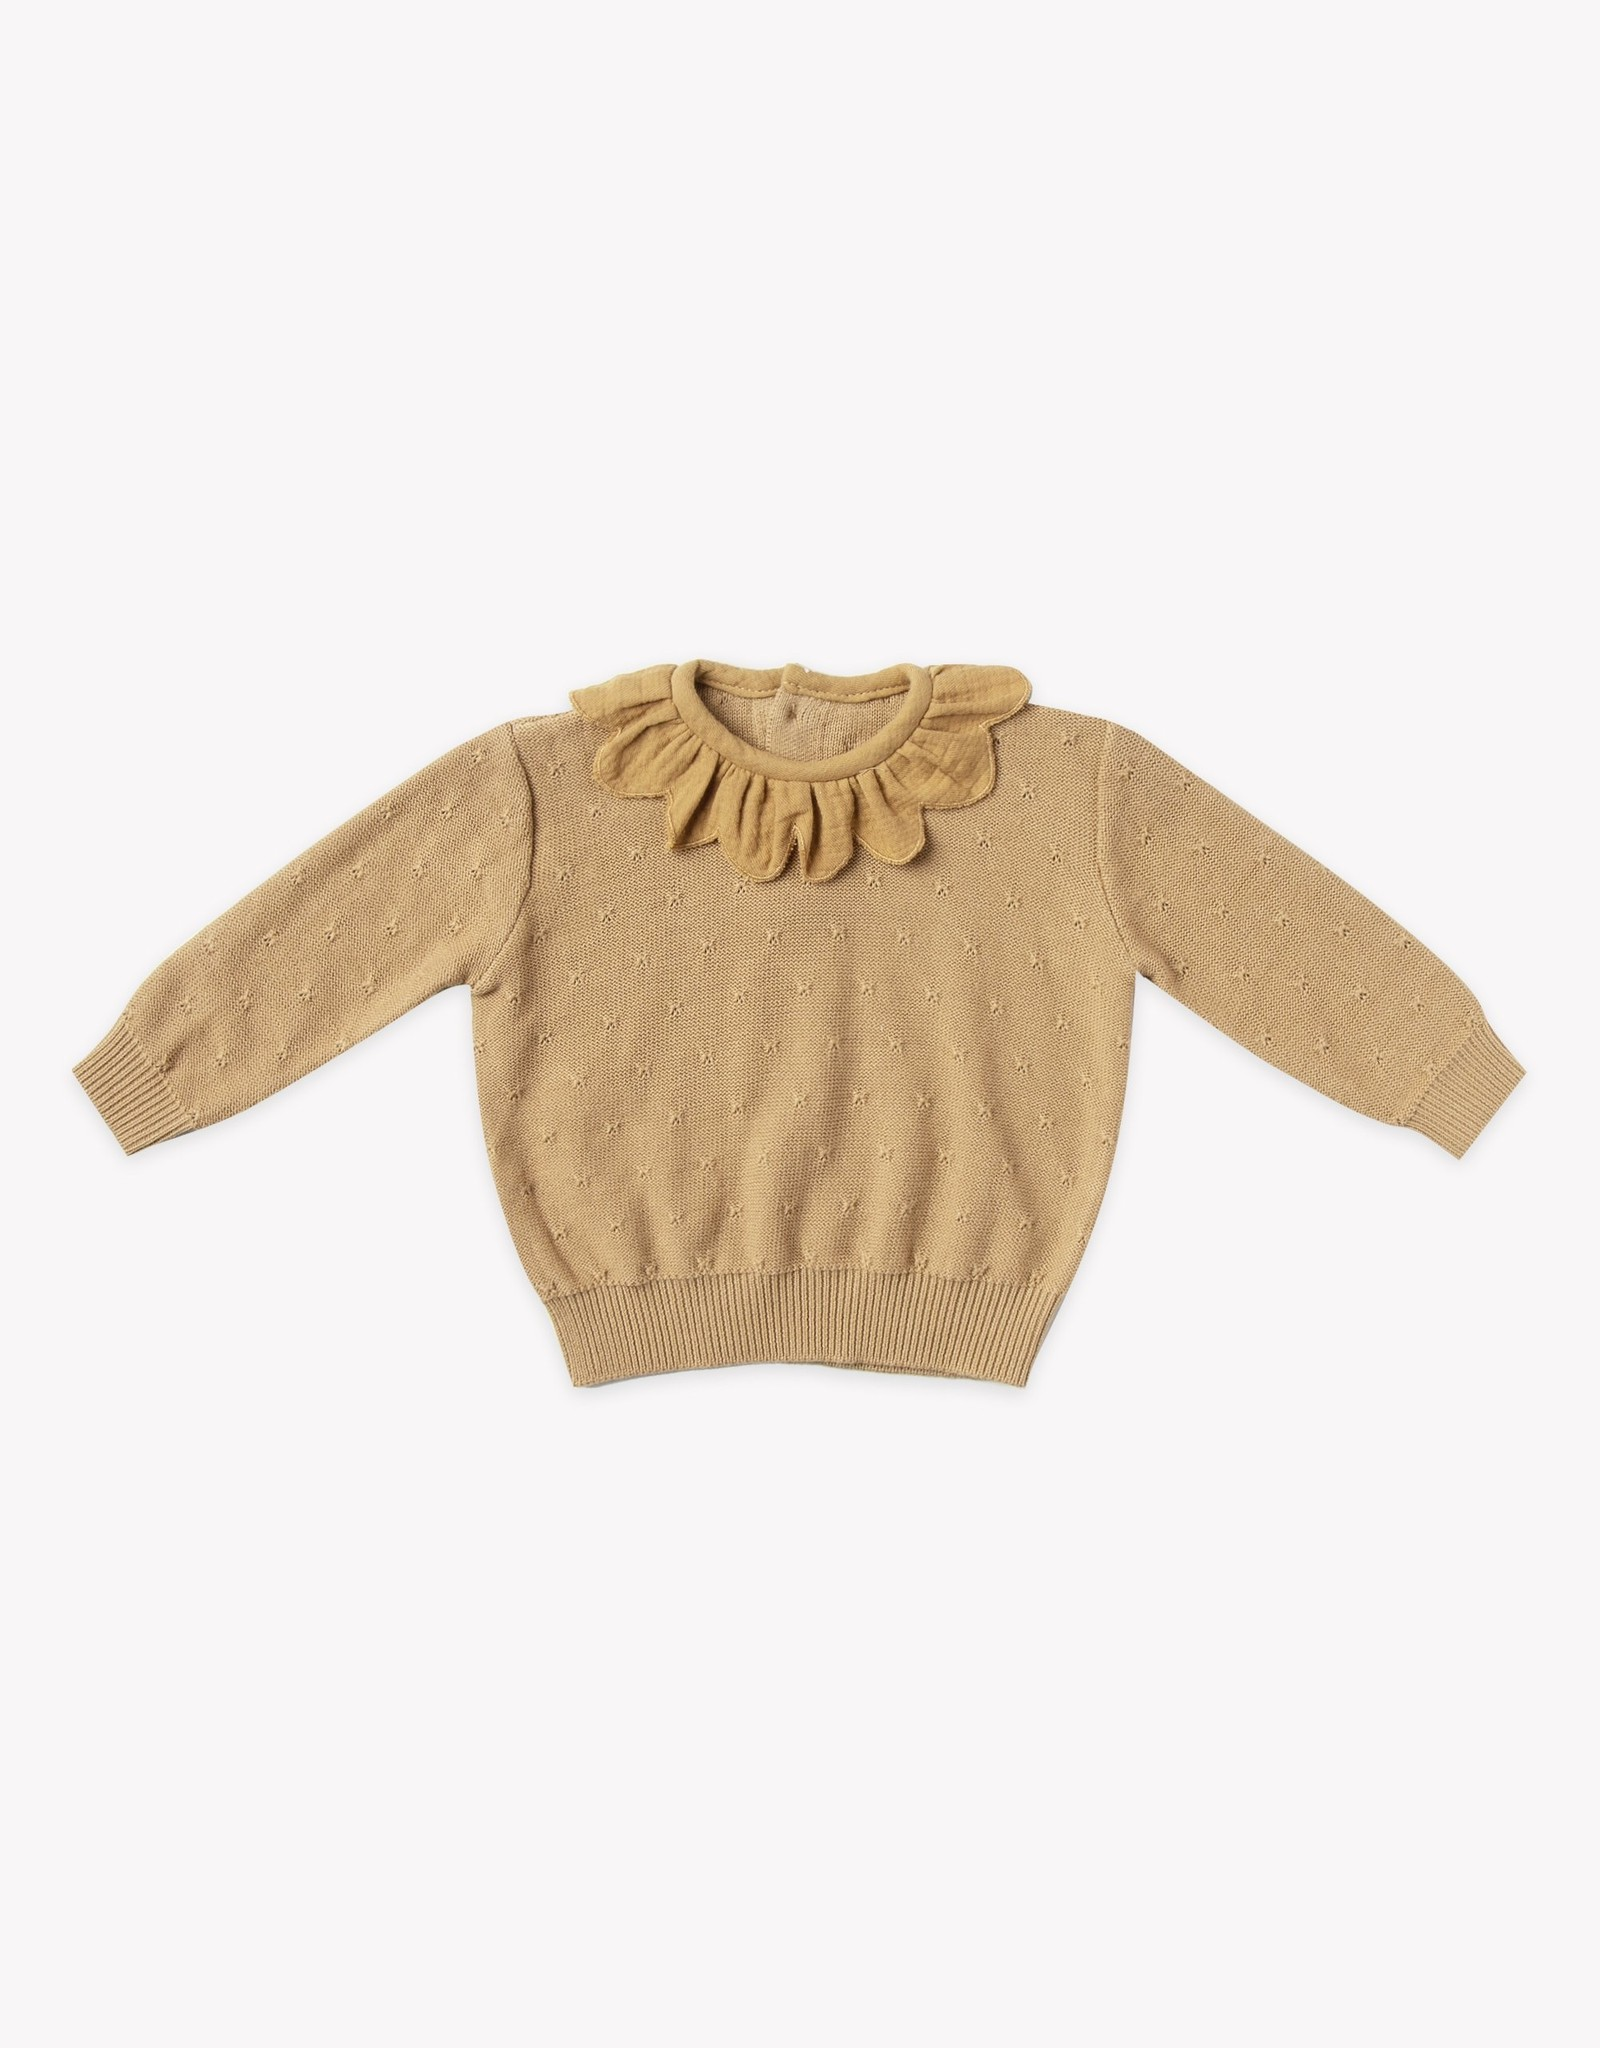 Quincy Mae Petal Knit Sweater